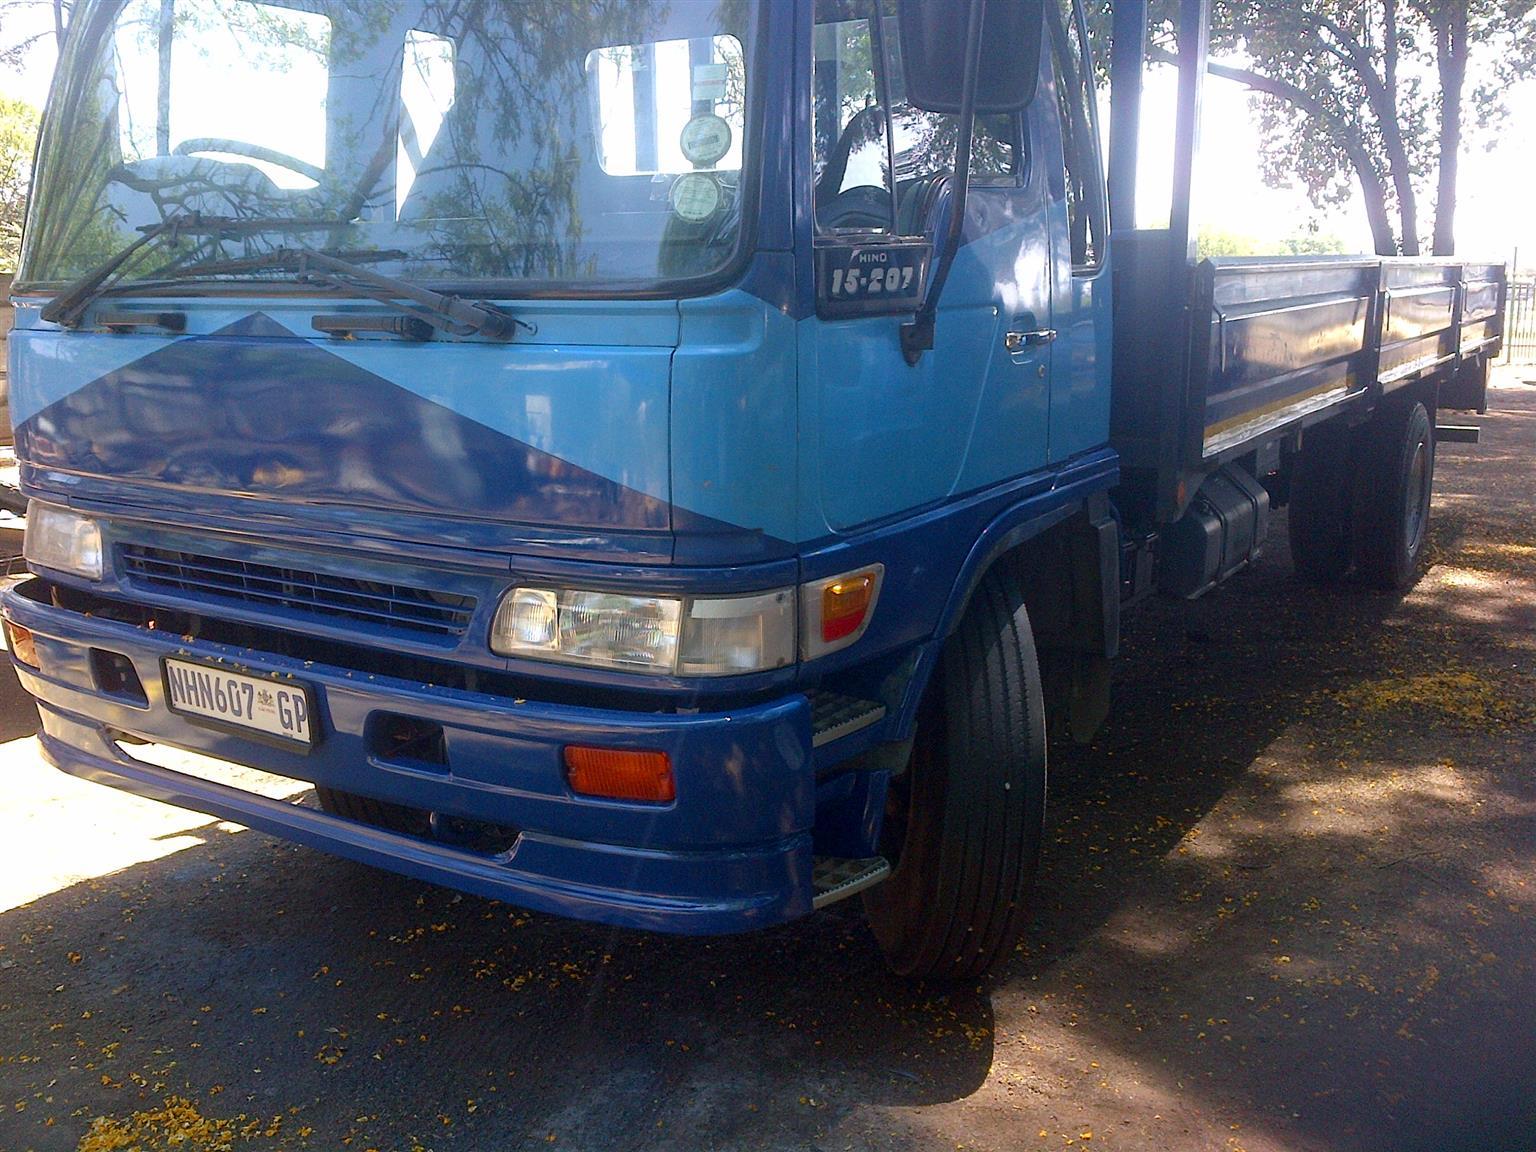 Hino 15-207 8ton dropside truck